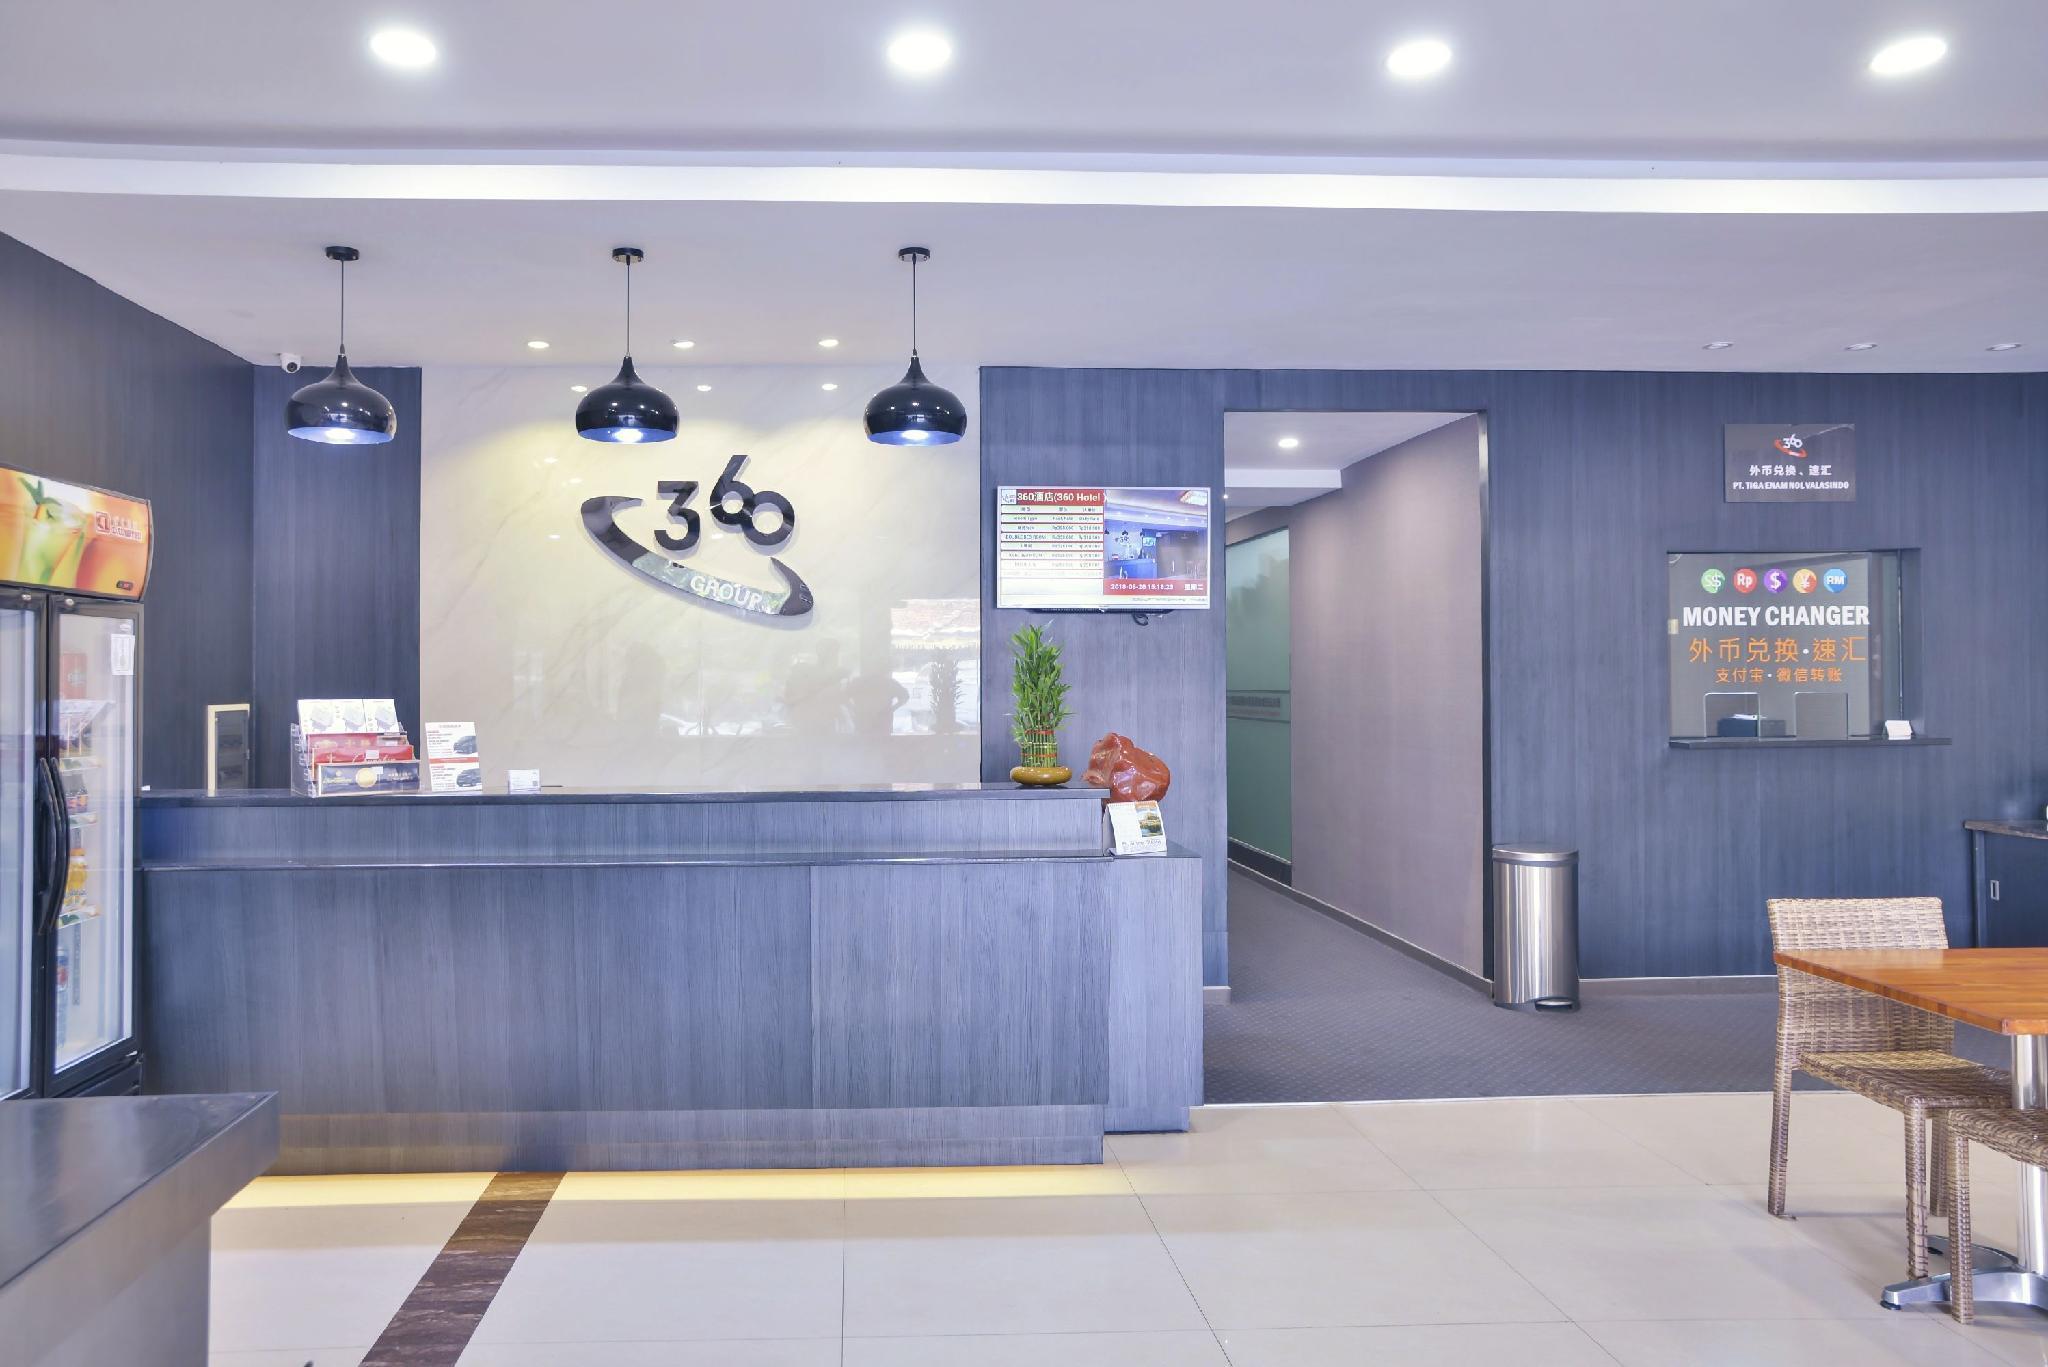 Hotel 360